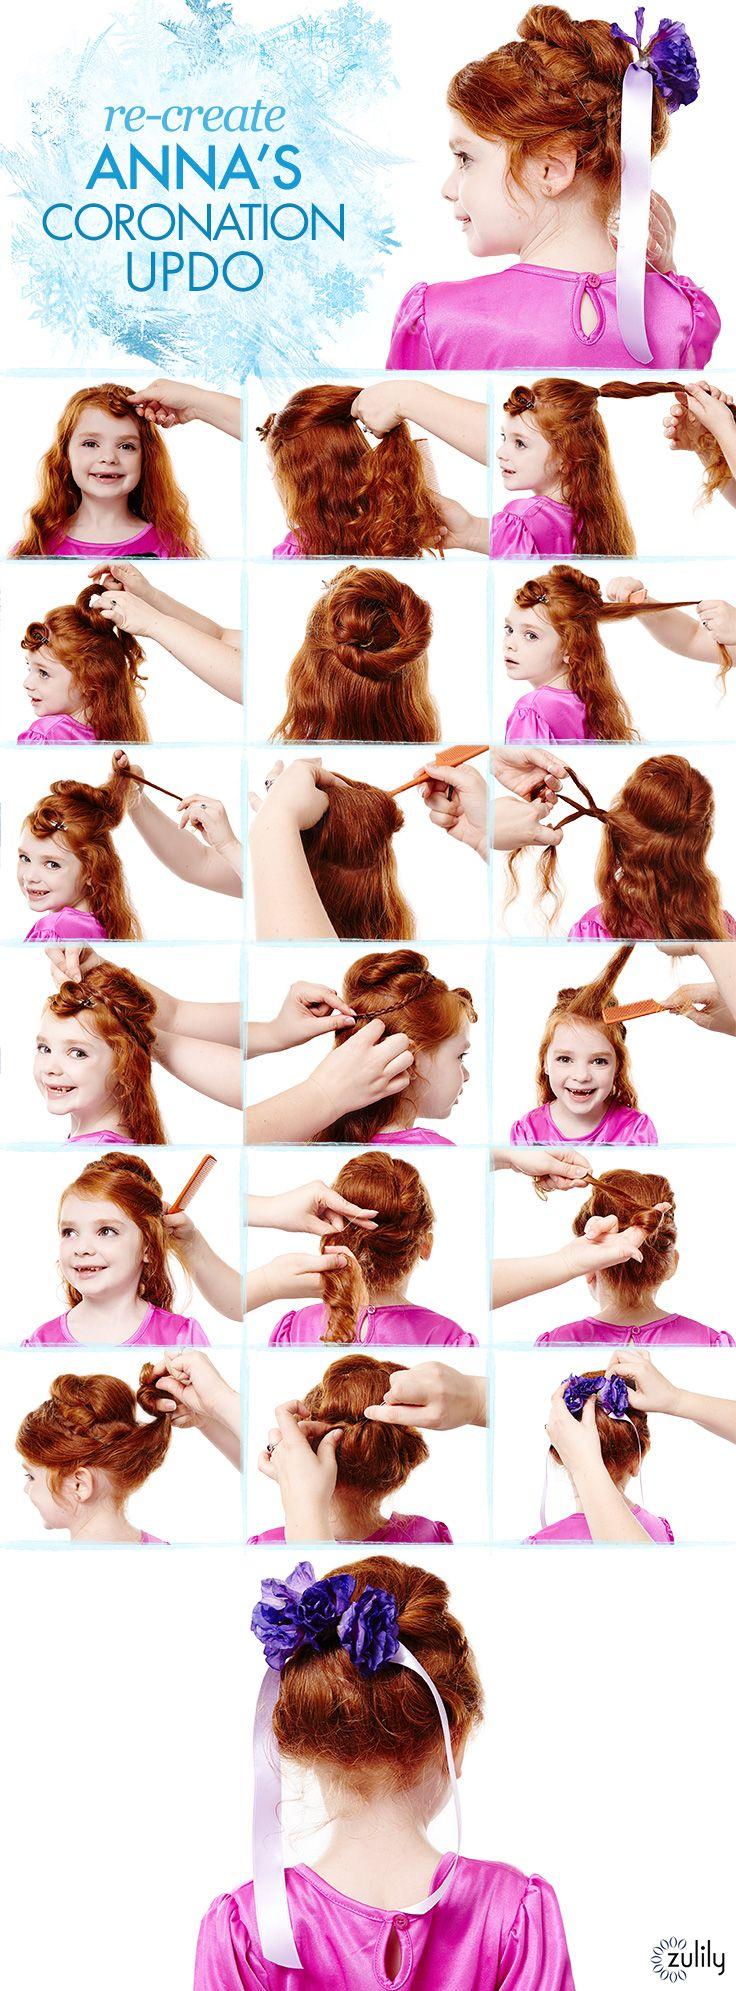 Frozen hair tutorial: Anna's coronation updo #Frozen #hairstyles #zulily